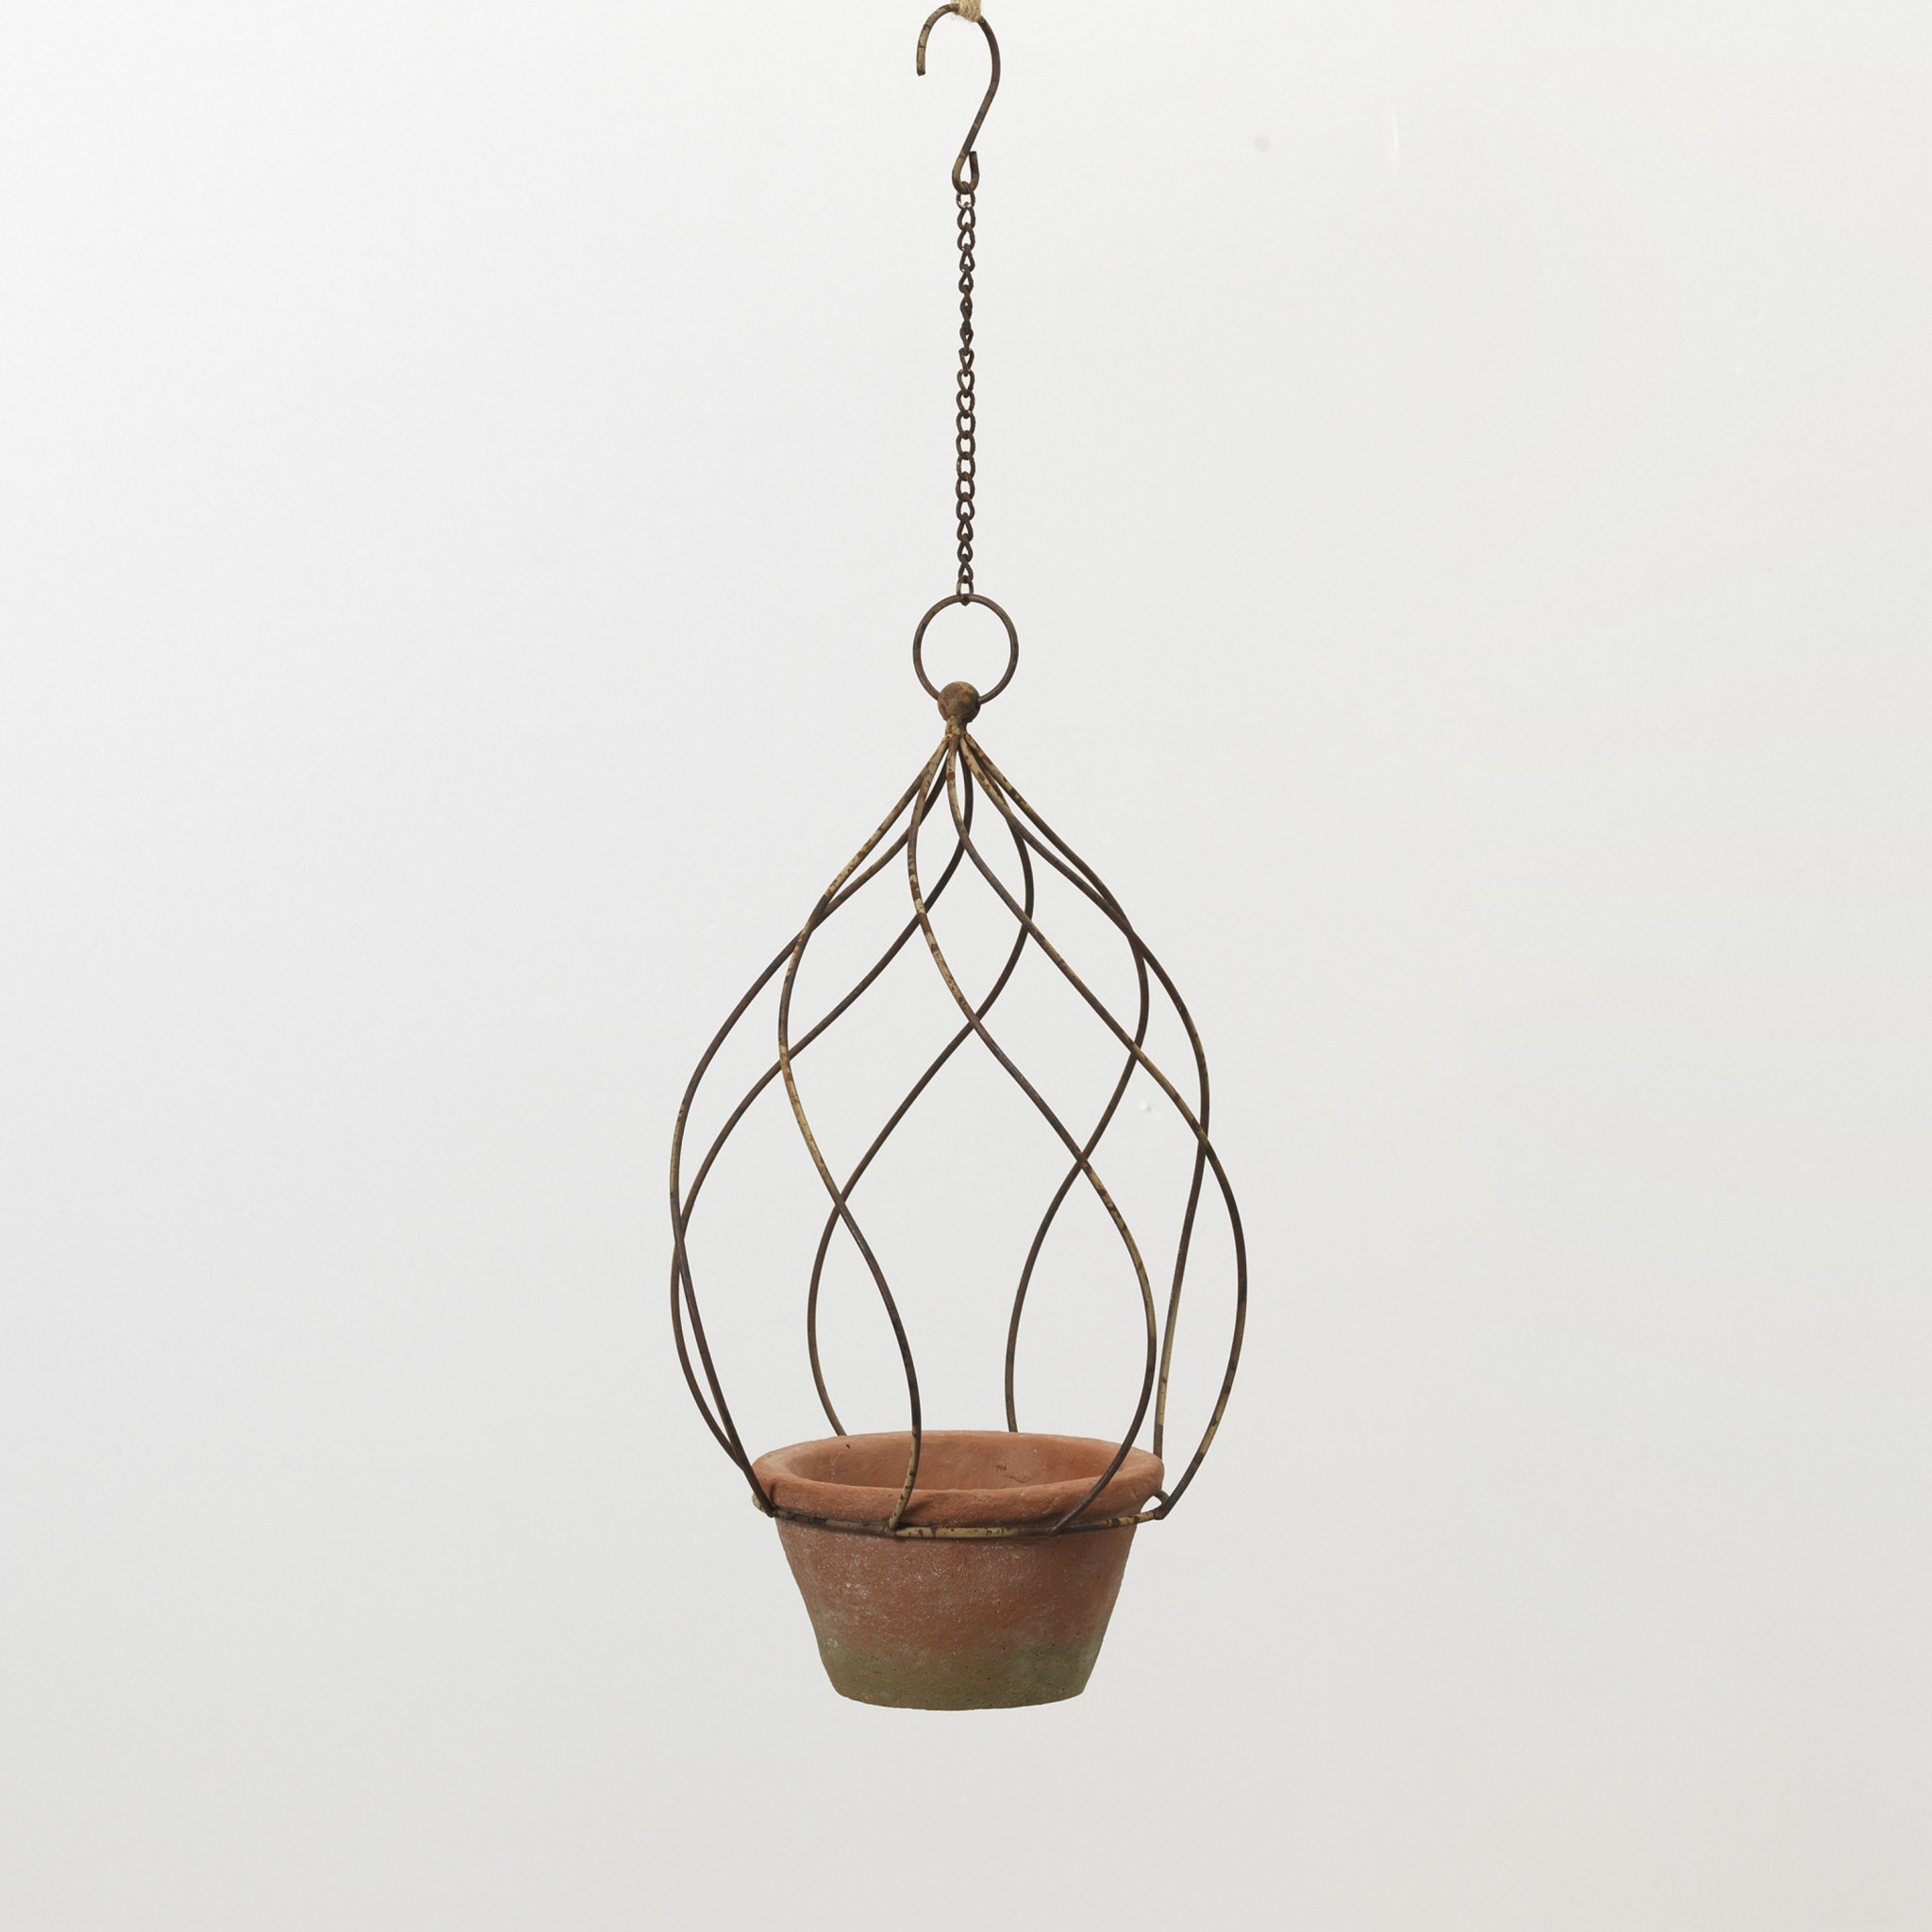 "11"" Metal Hanging Planter with Pot"